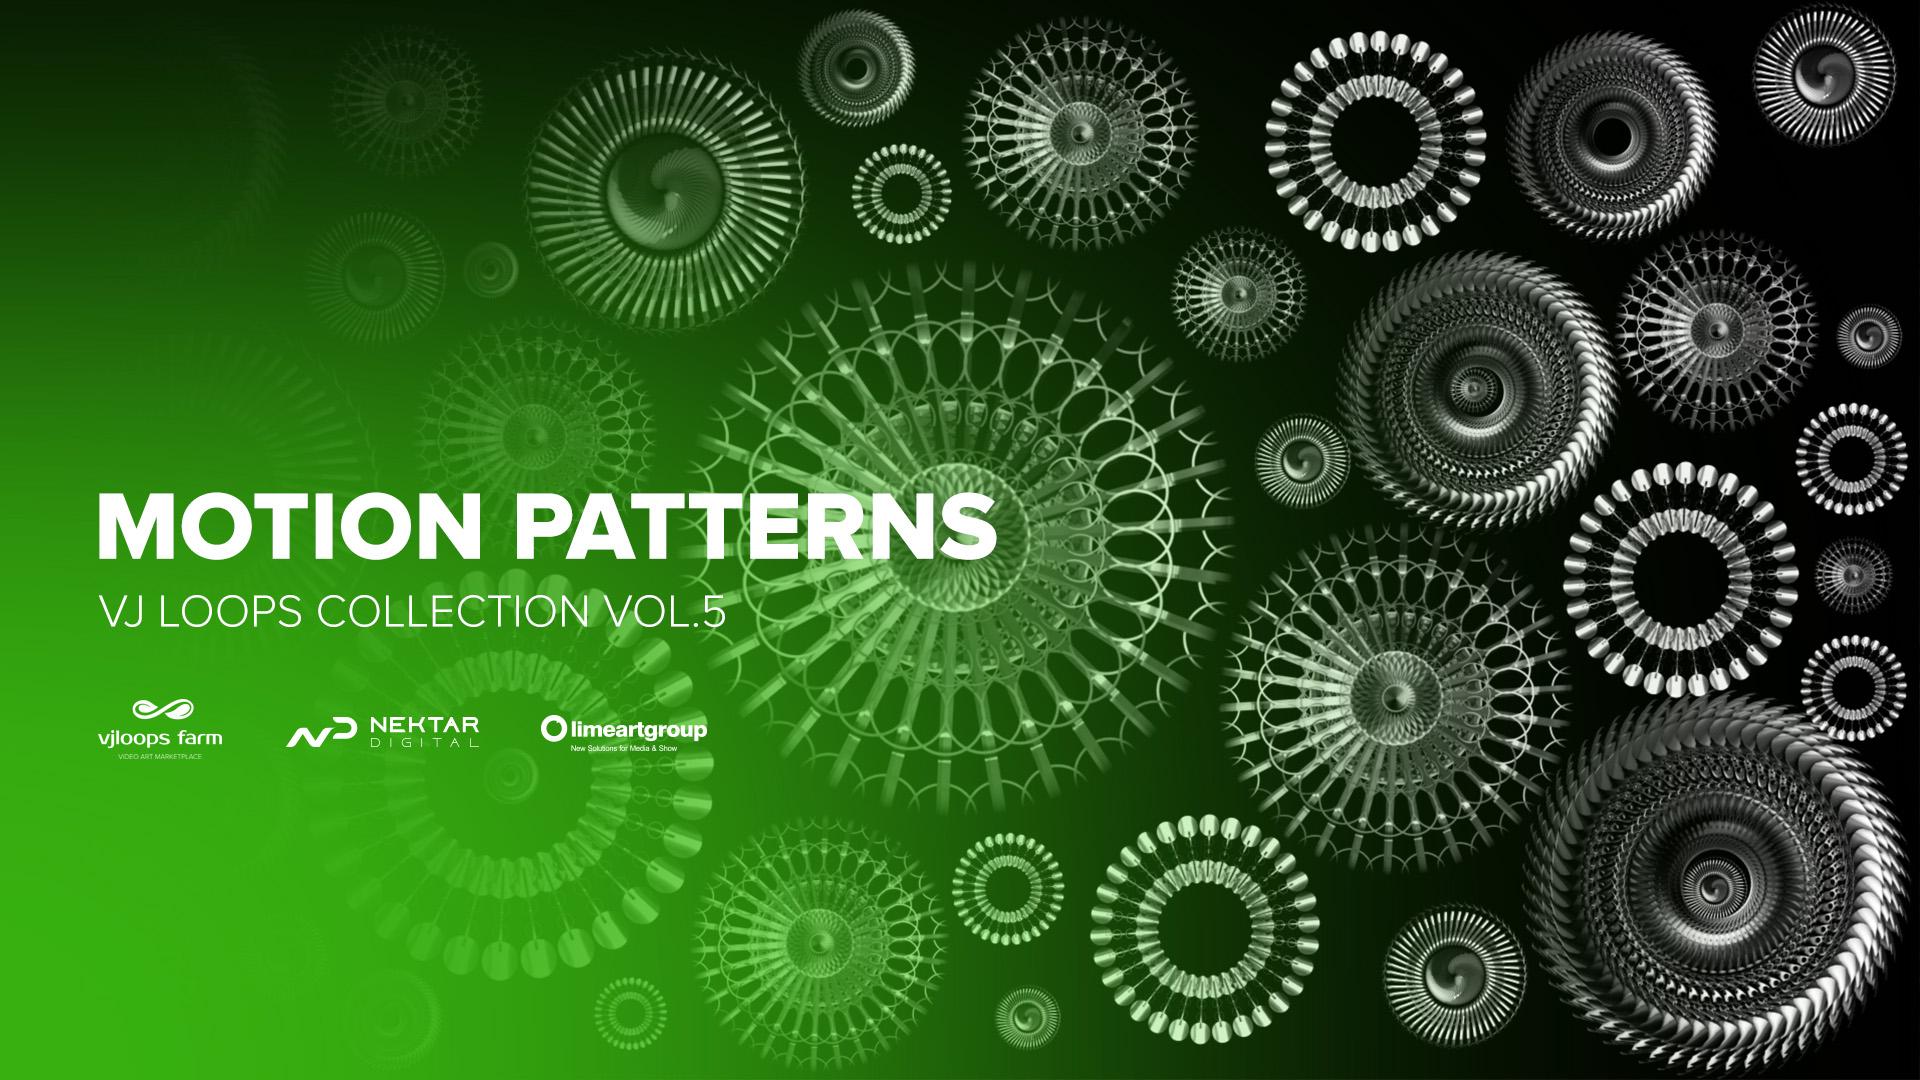 Motion Patterns VJ LOOPS